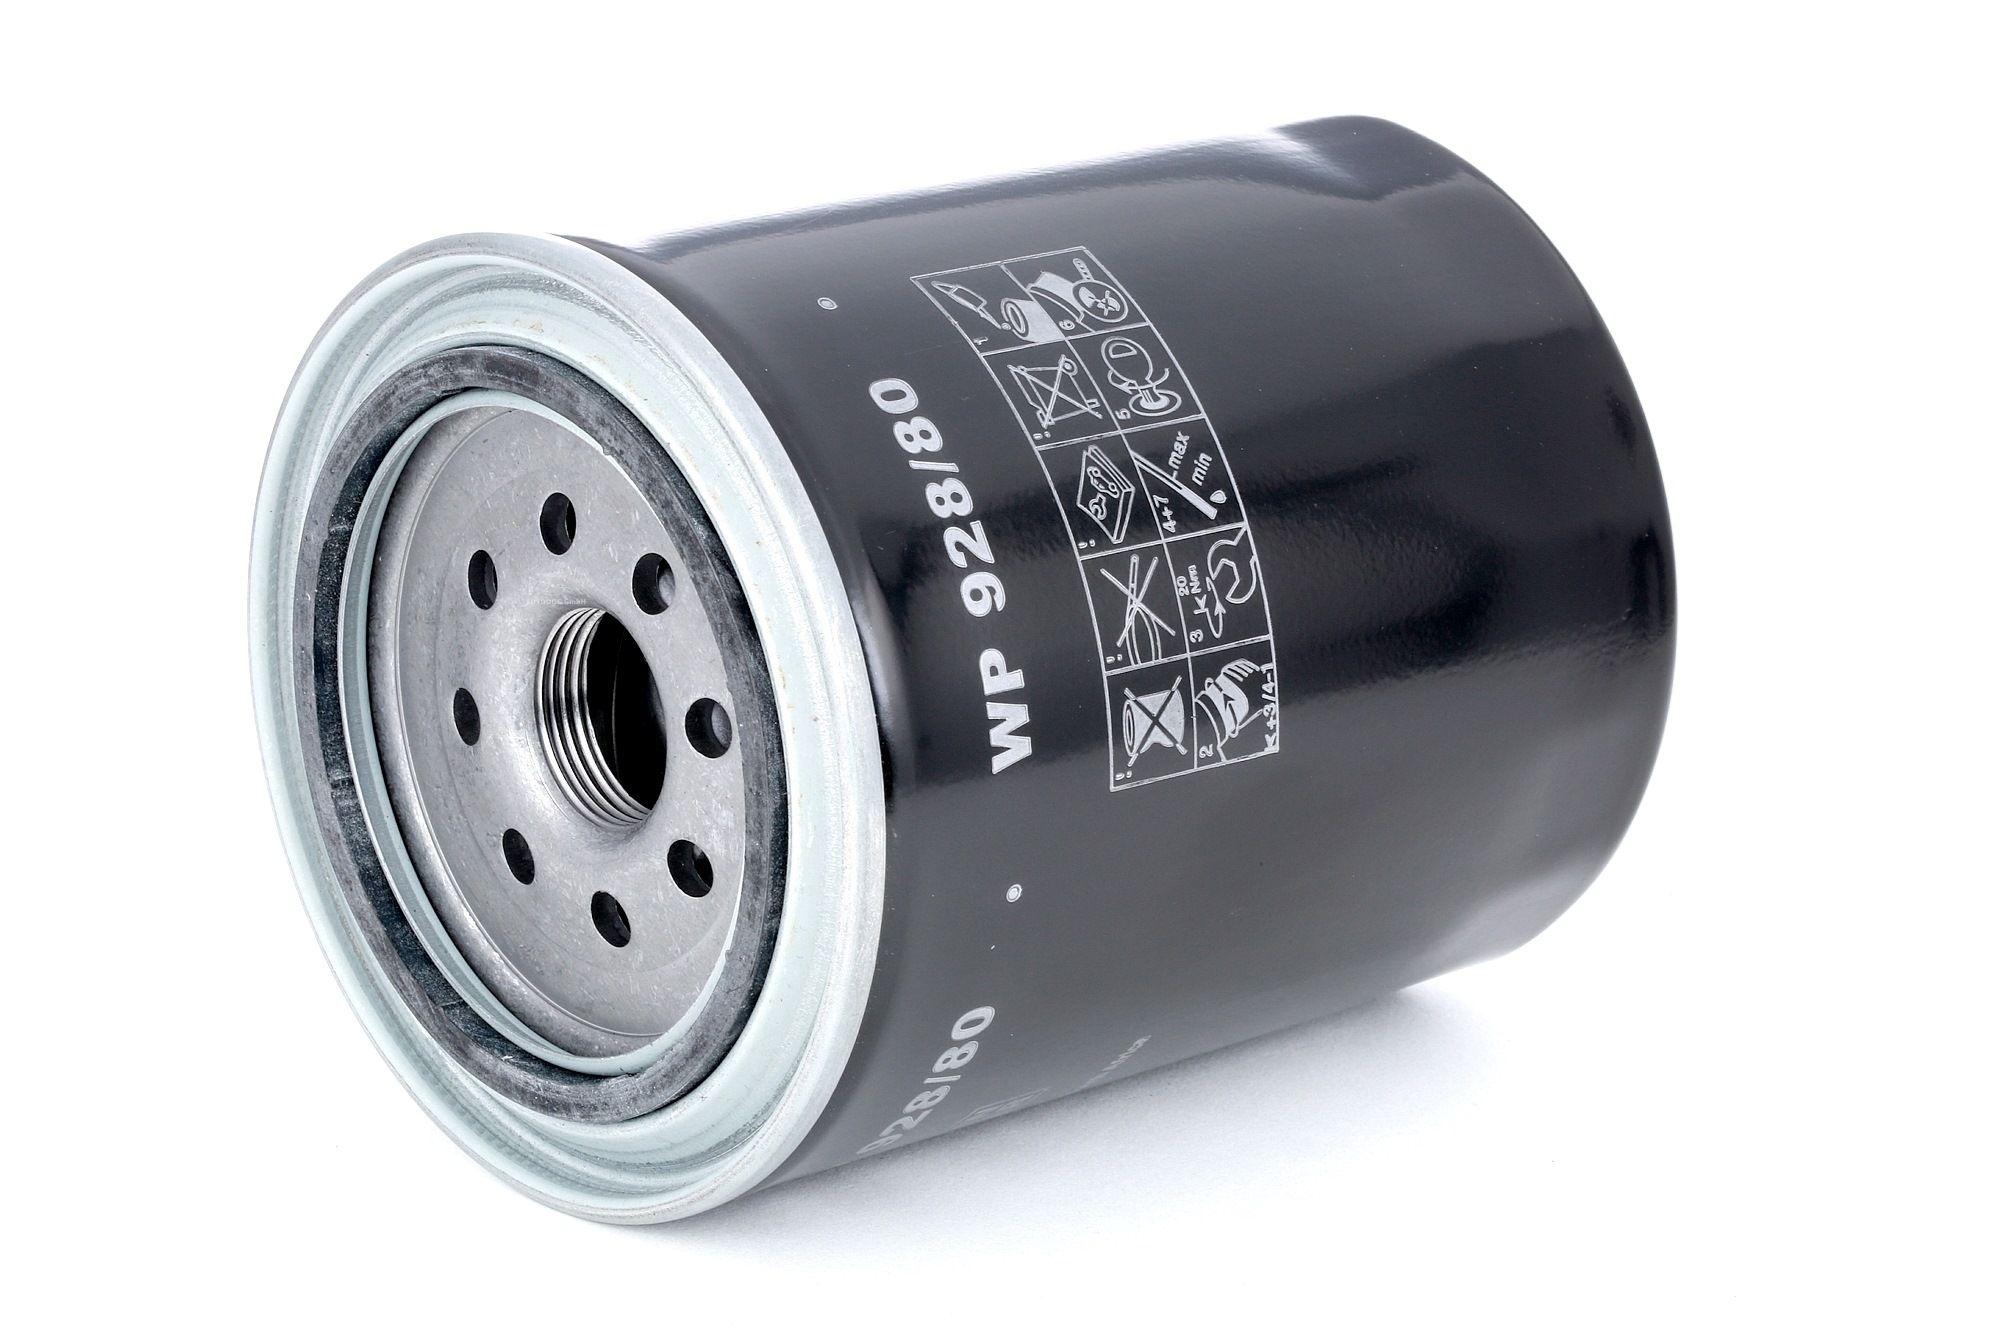 MANN-FILTER: Original Autofilter WP 928/80 (Innendurchmesser 2: 72mm, Innendurchmesser 2: 72mm, Ø: 102mm, Außendurchmesser 2: 80mm, Höhe: 126mm)